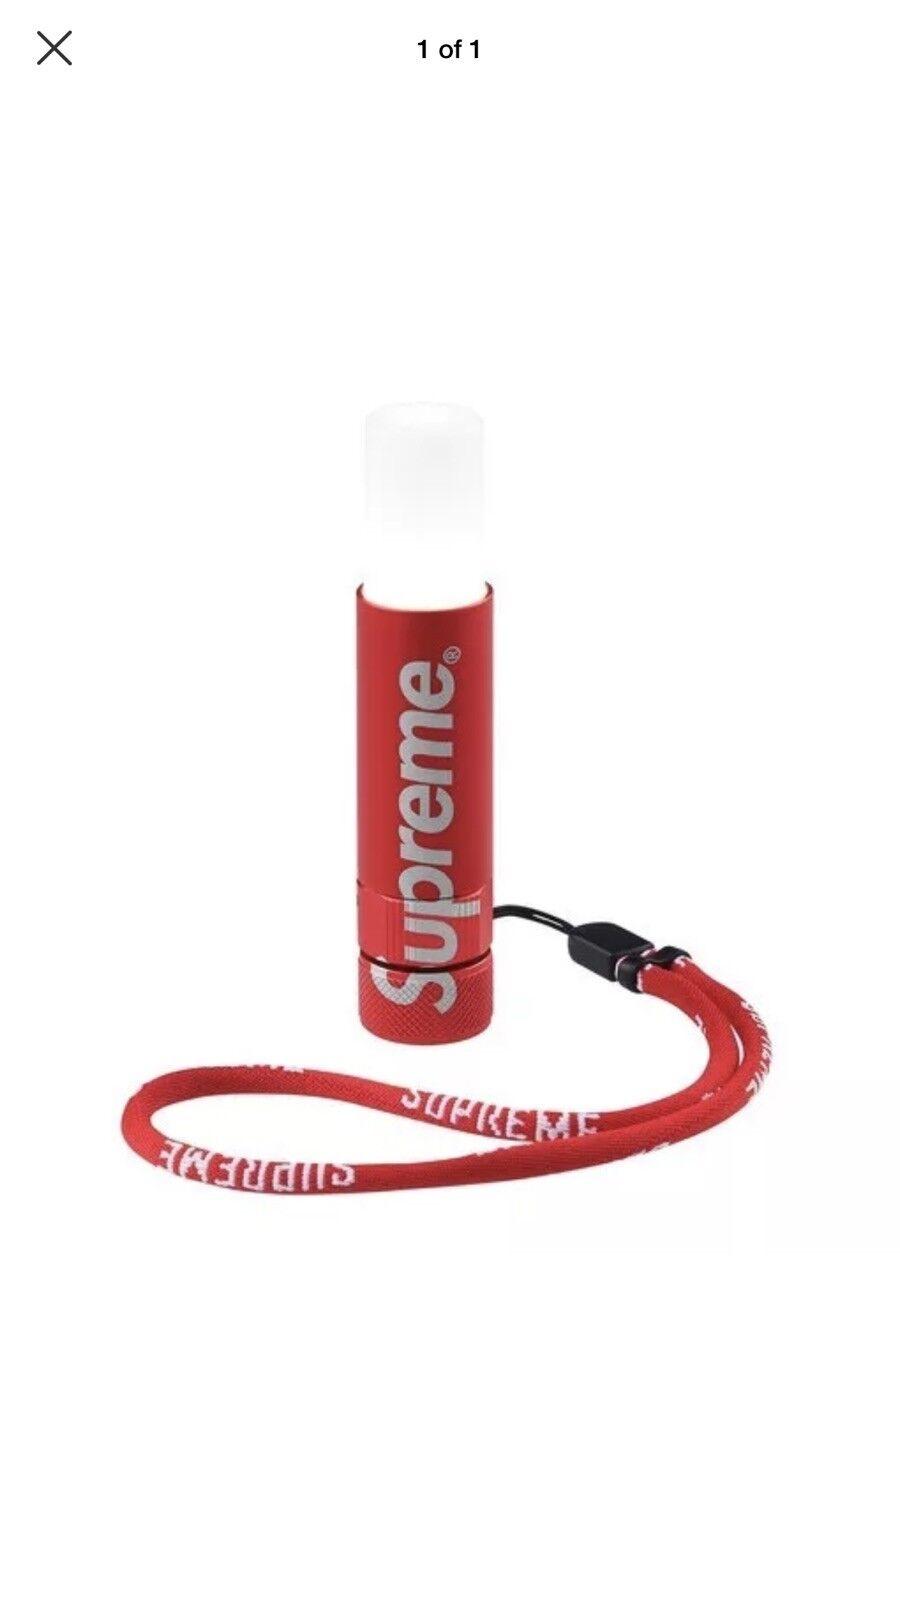 Supreme Nitecore Mini Flashlight  FW17 - Brand NEW  free shipping!